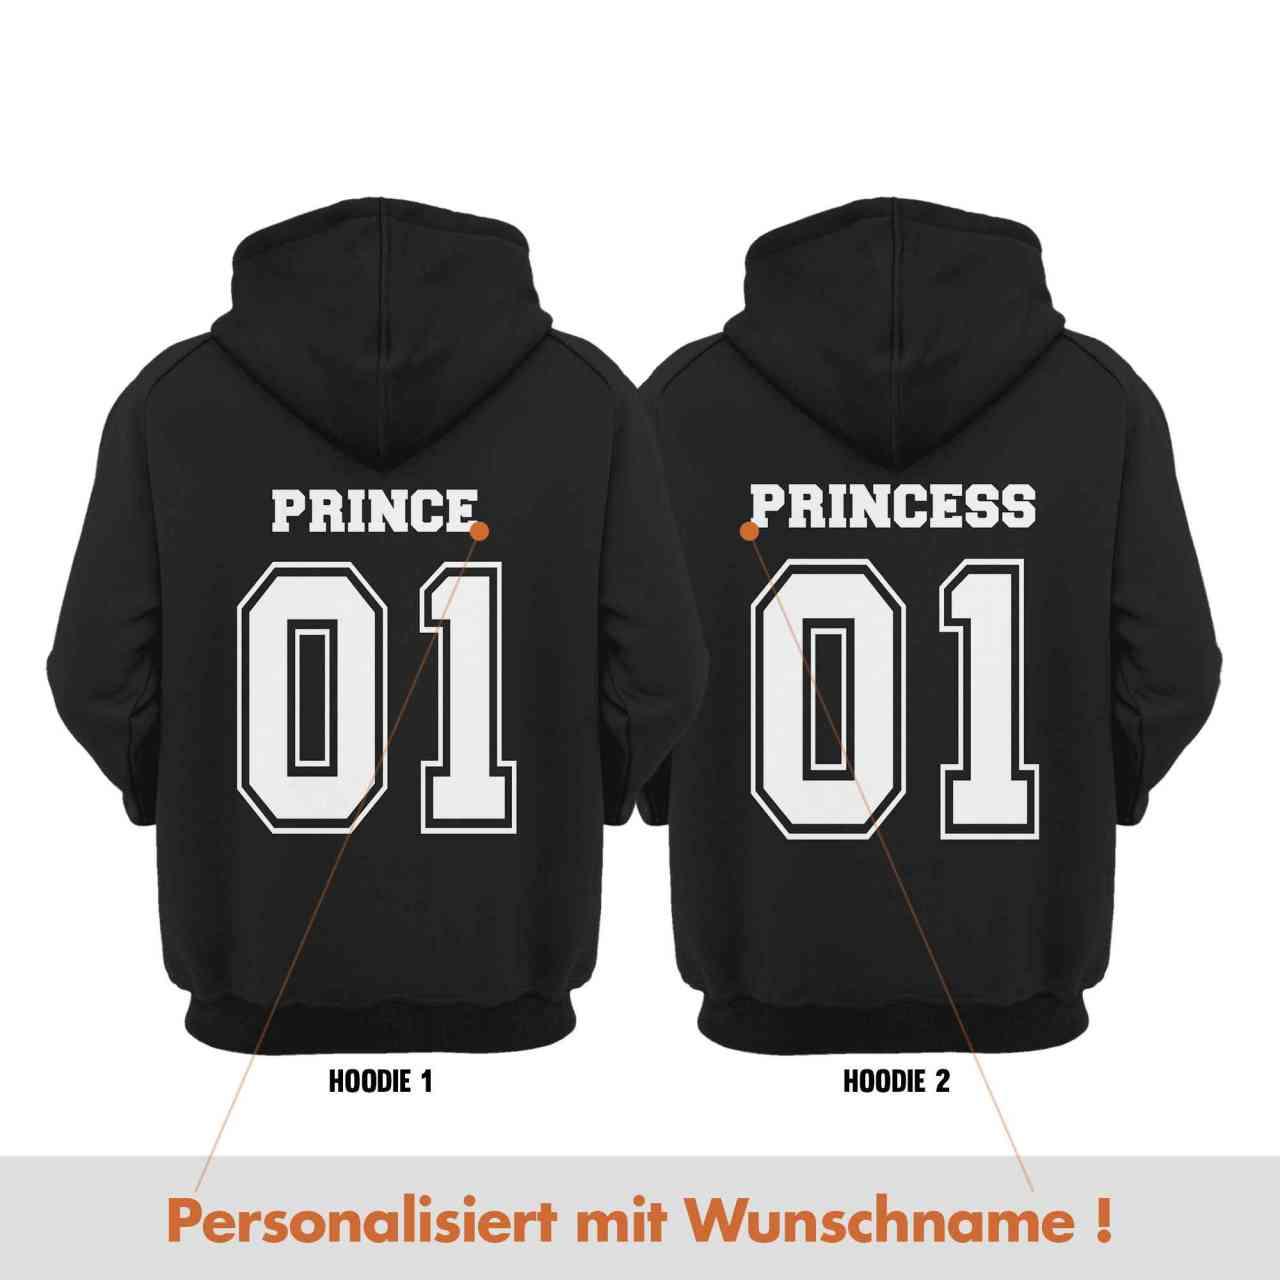 Prince Princess Partnerlook Hoodie Pulli mit Wunsch Namen | personalisiert